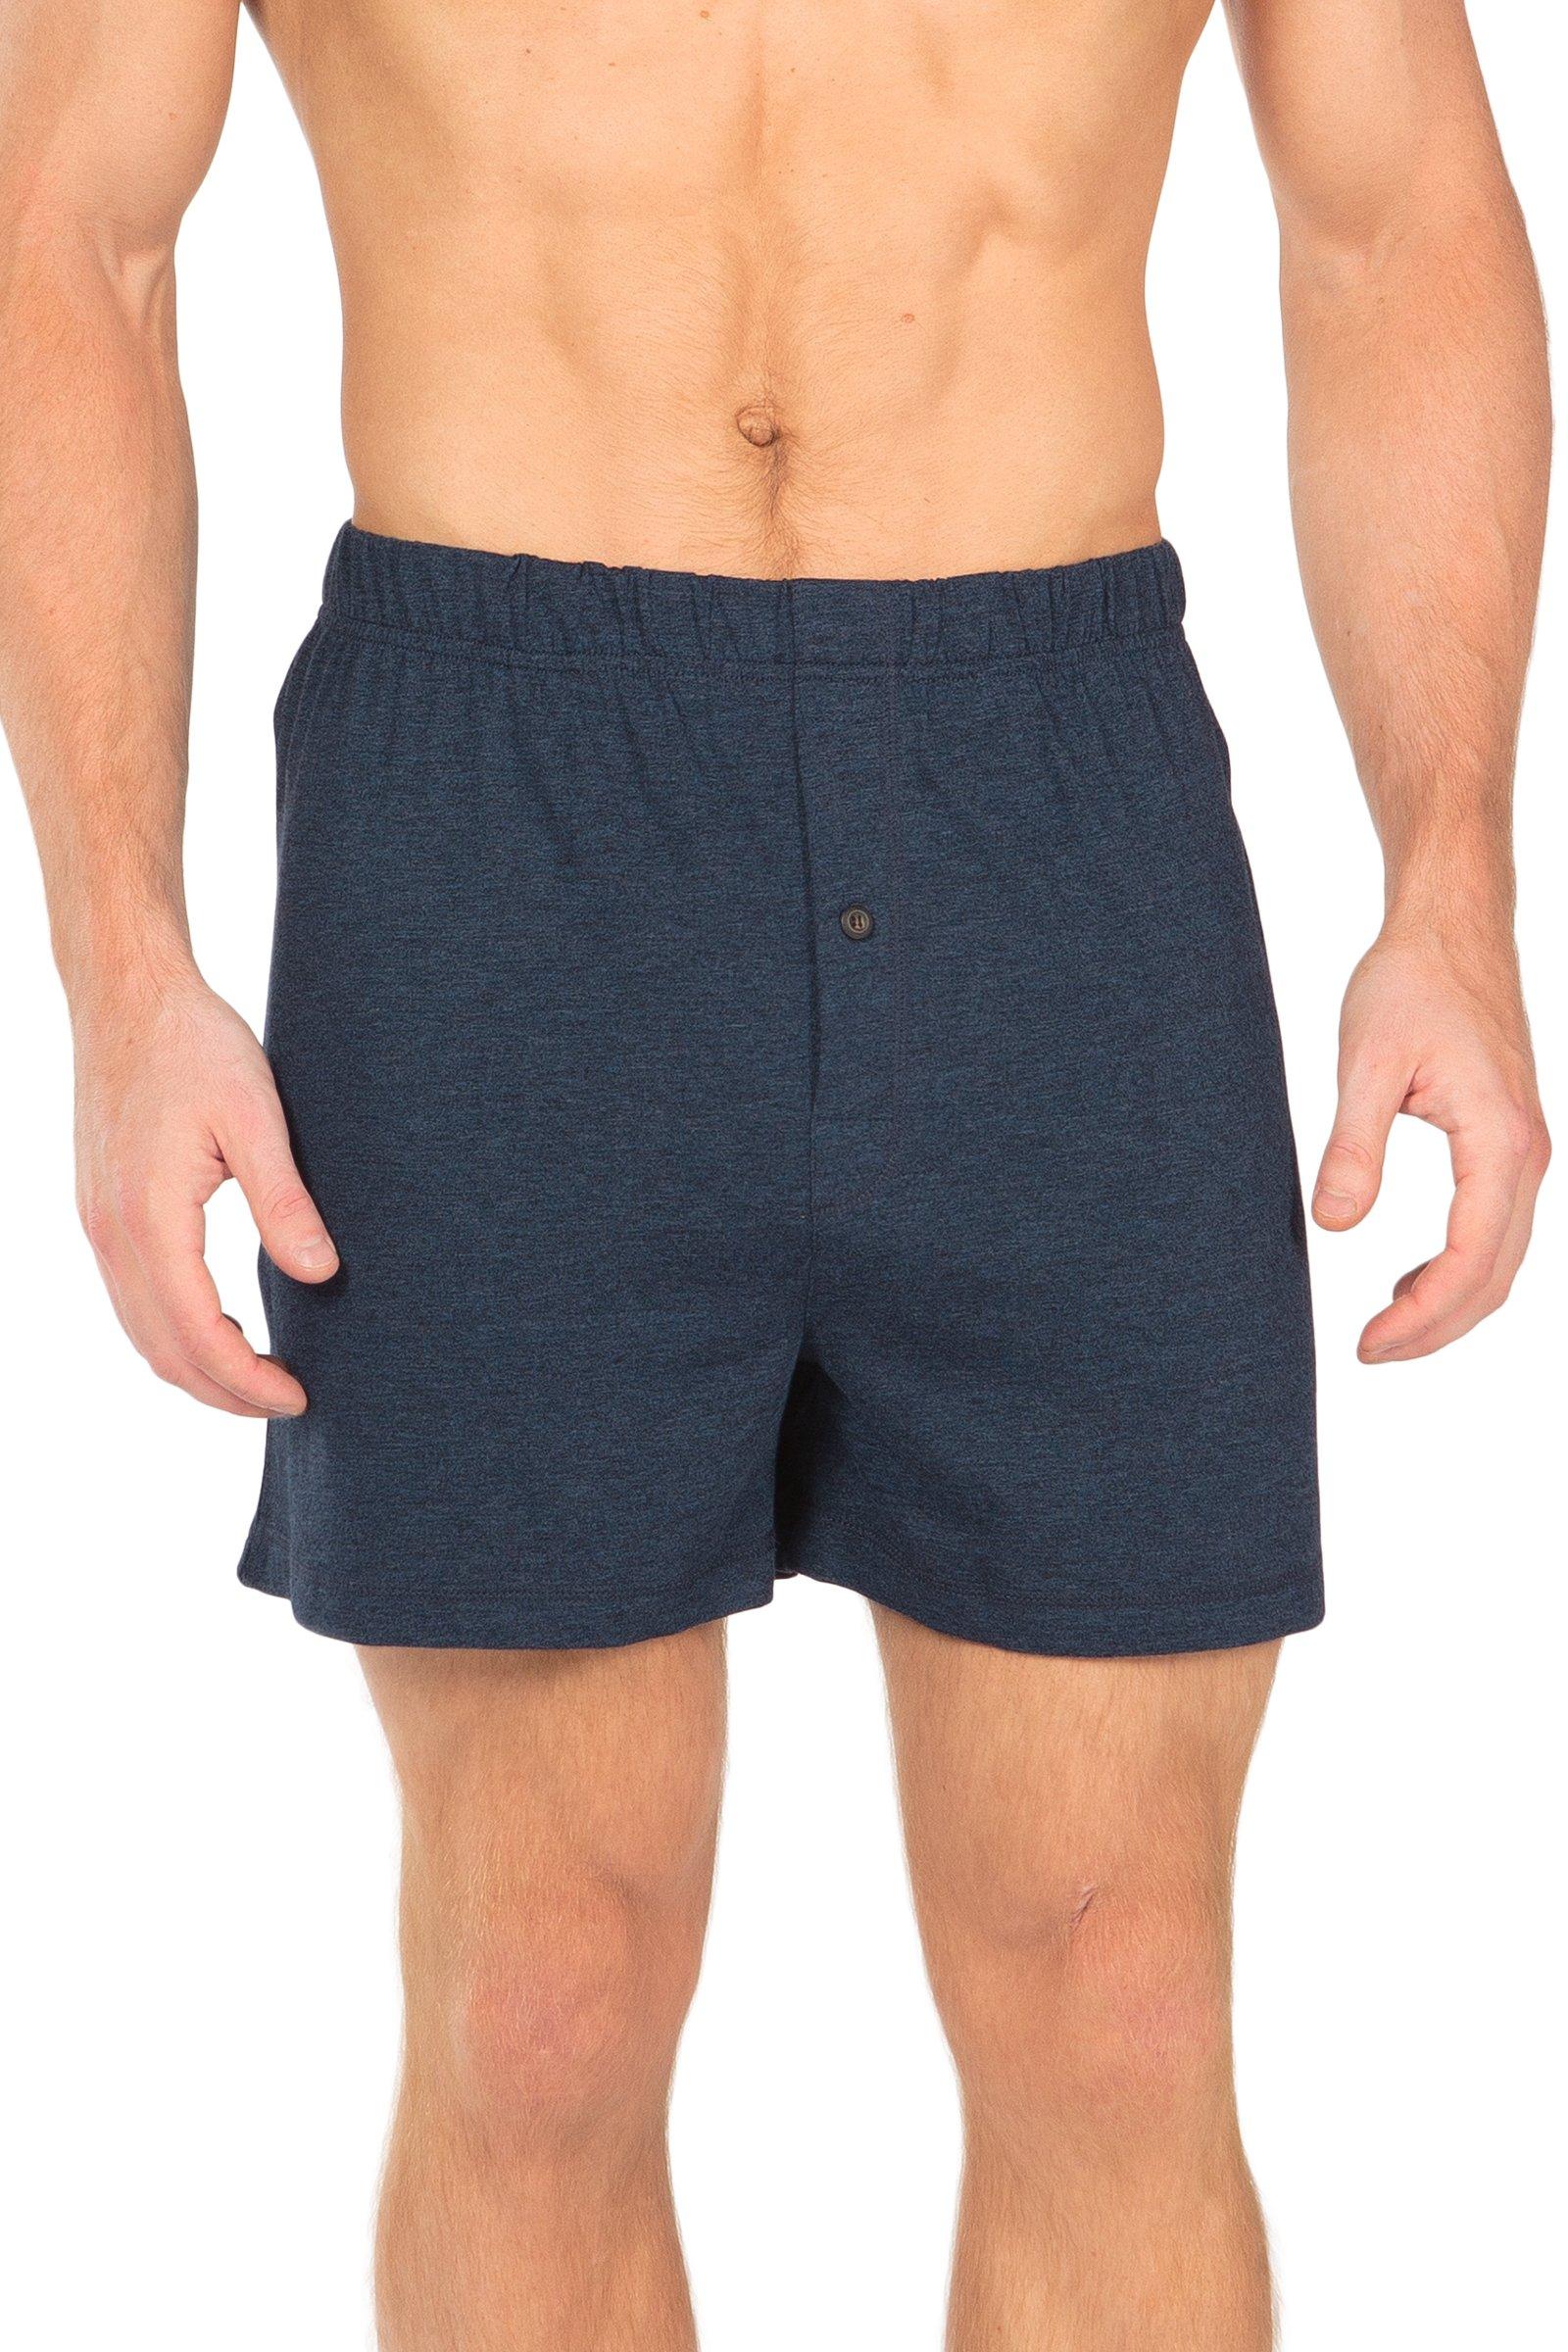 Men's Boxer Shorts - Single Pack Bamboo Viscose Underwear by Texere (Sancus, Heather Blue, Large) Most Comfortable Men's Boxers MB6104-2U1-L